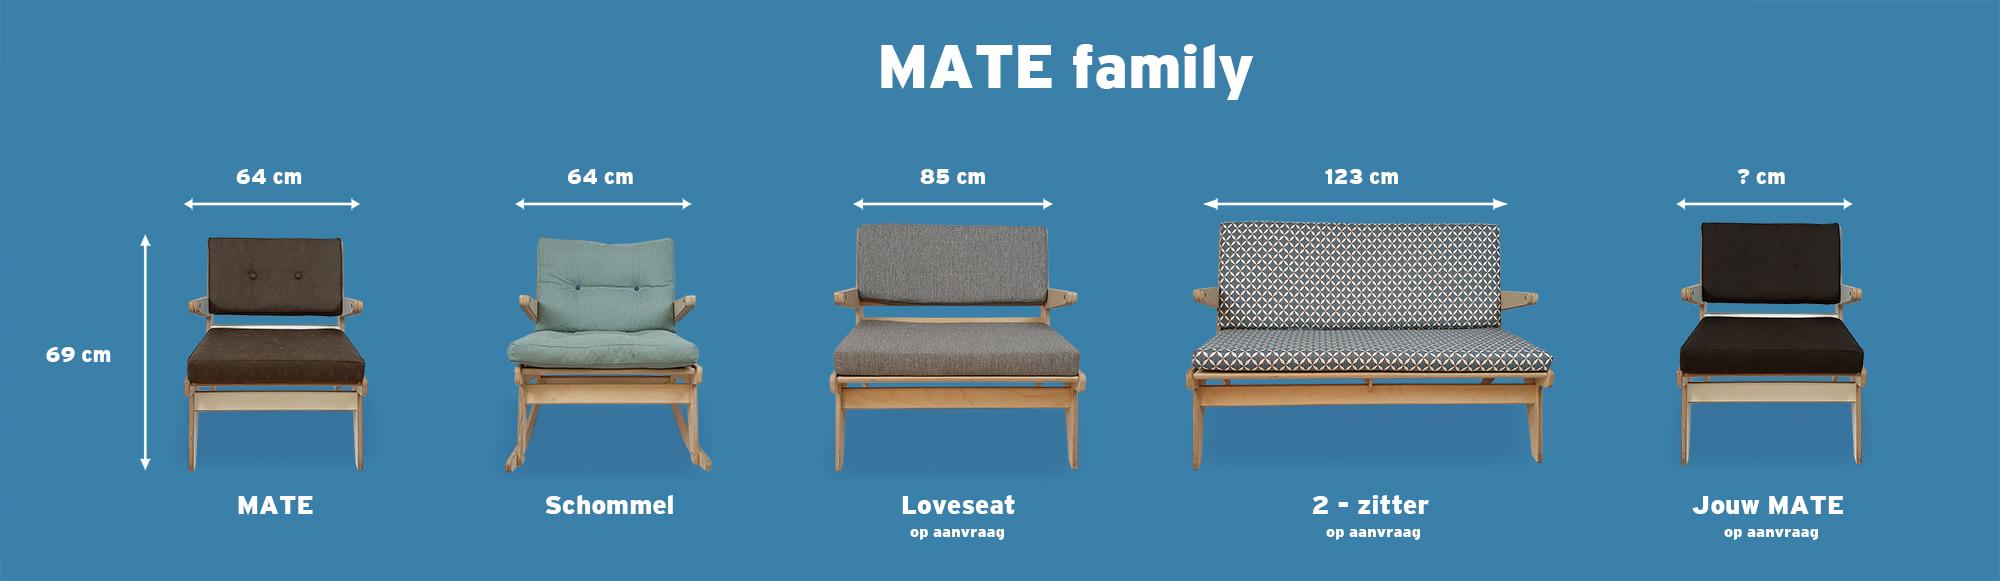 mate family2